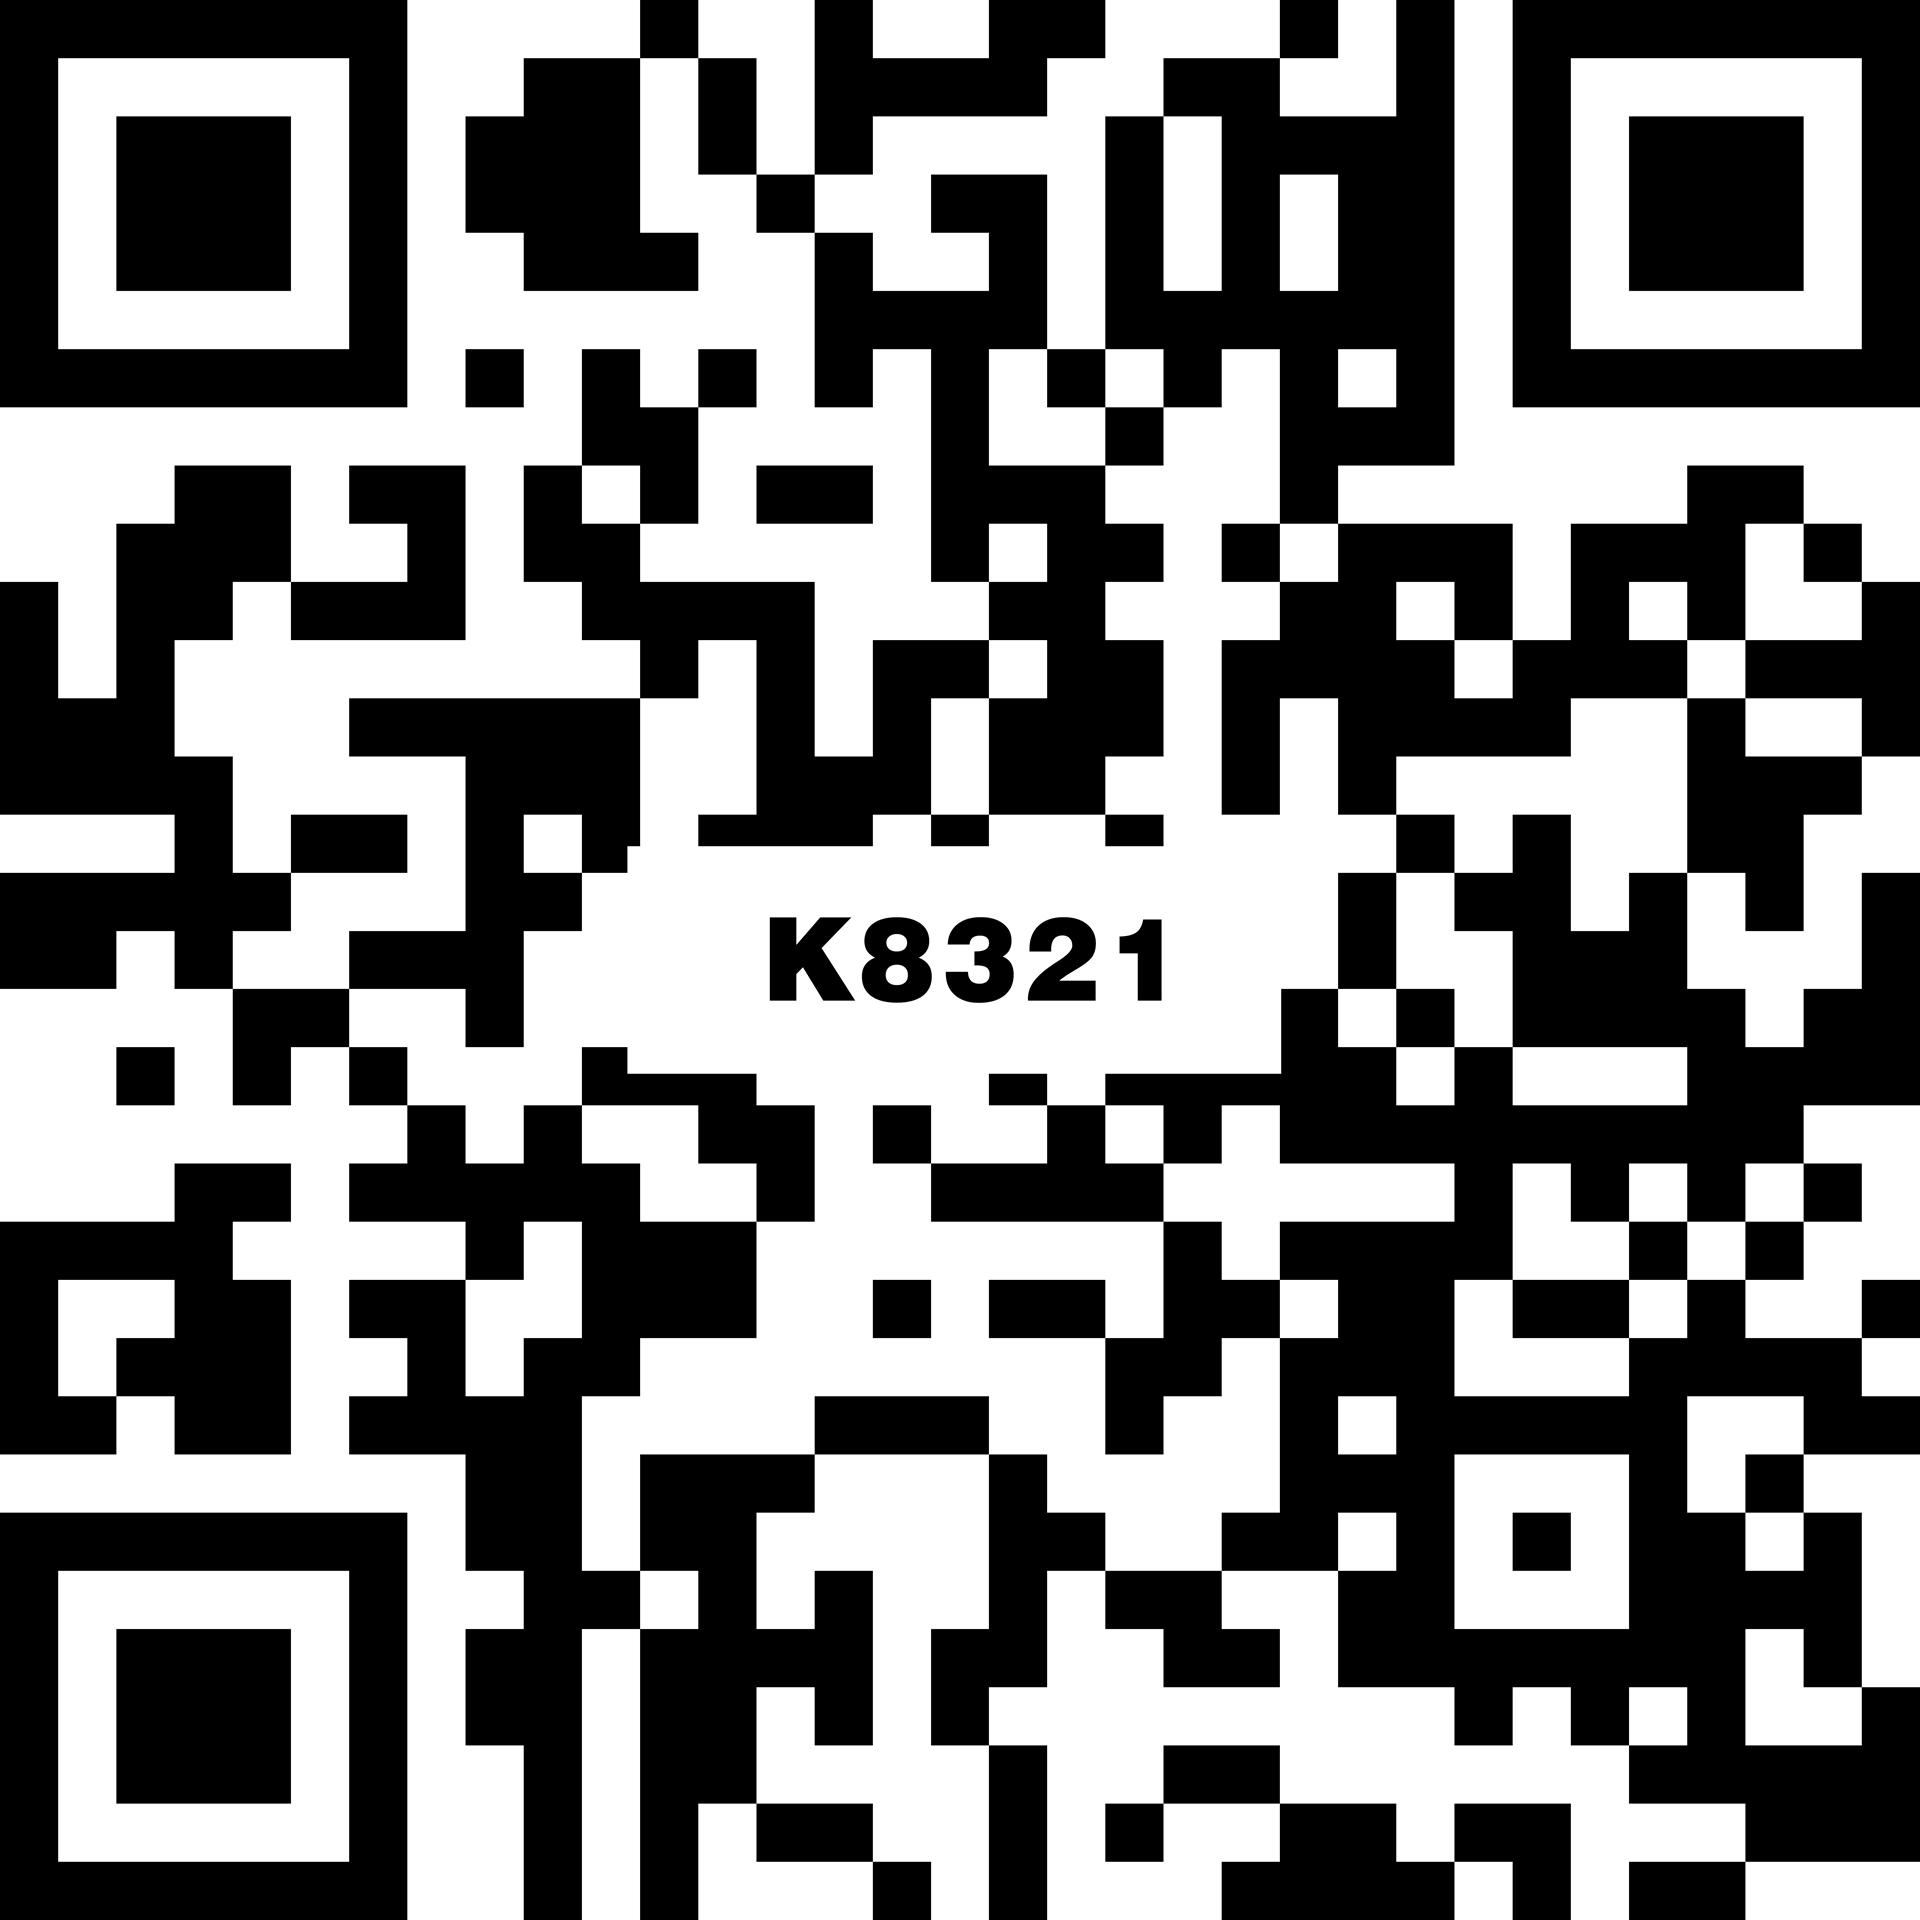 K8321